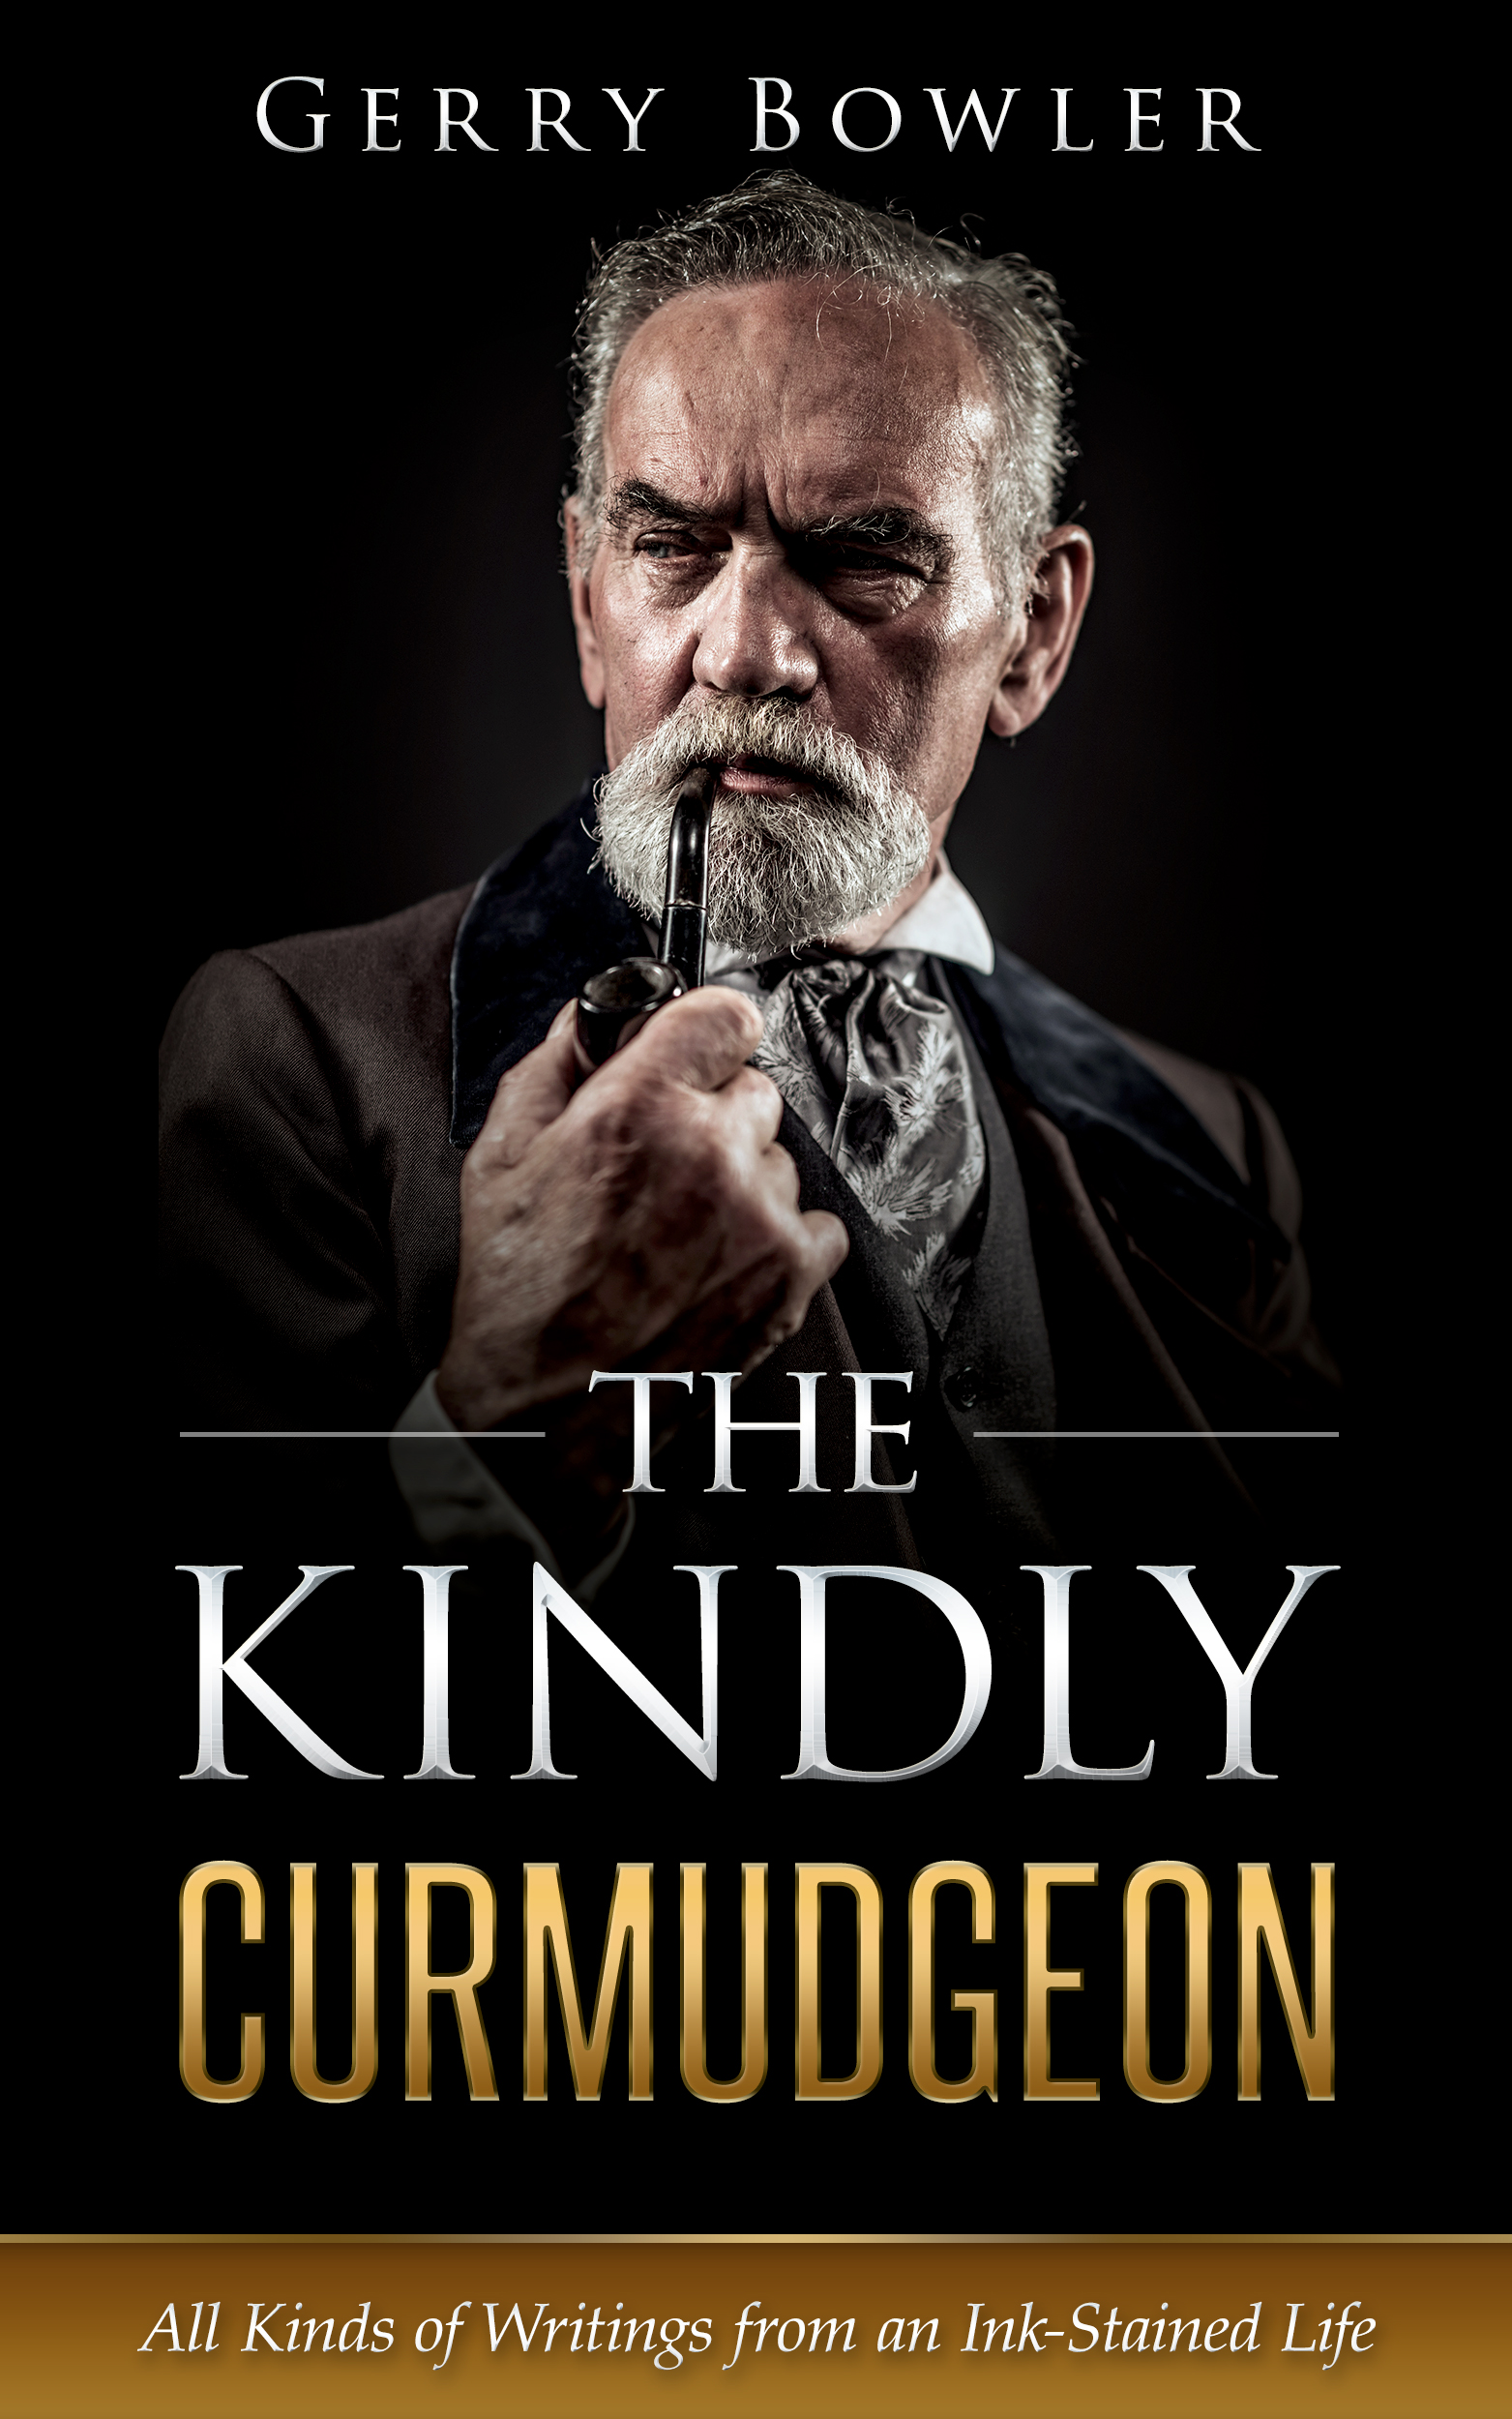 thekindlycurmudgeon